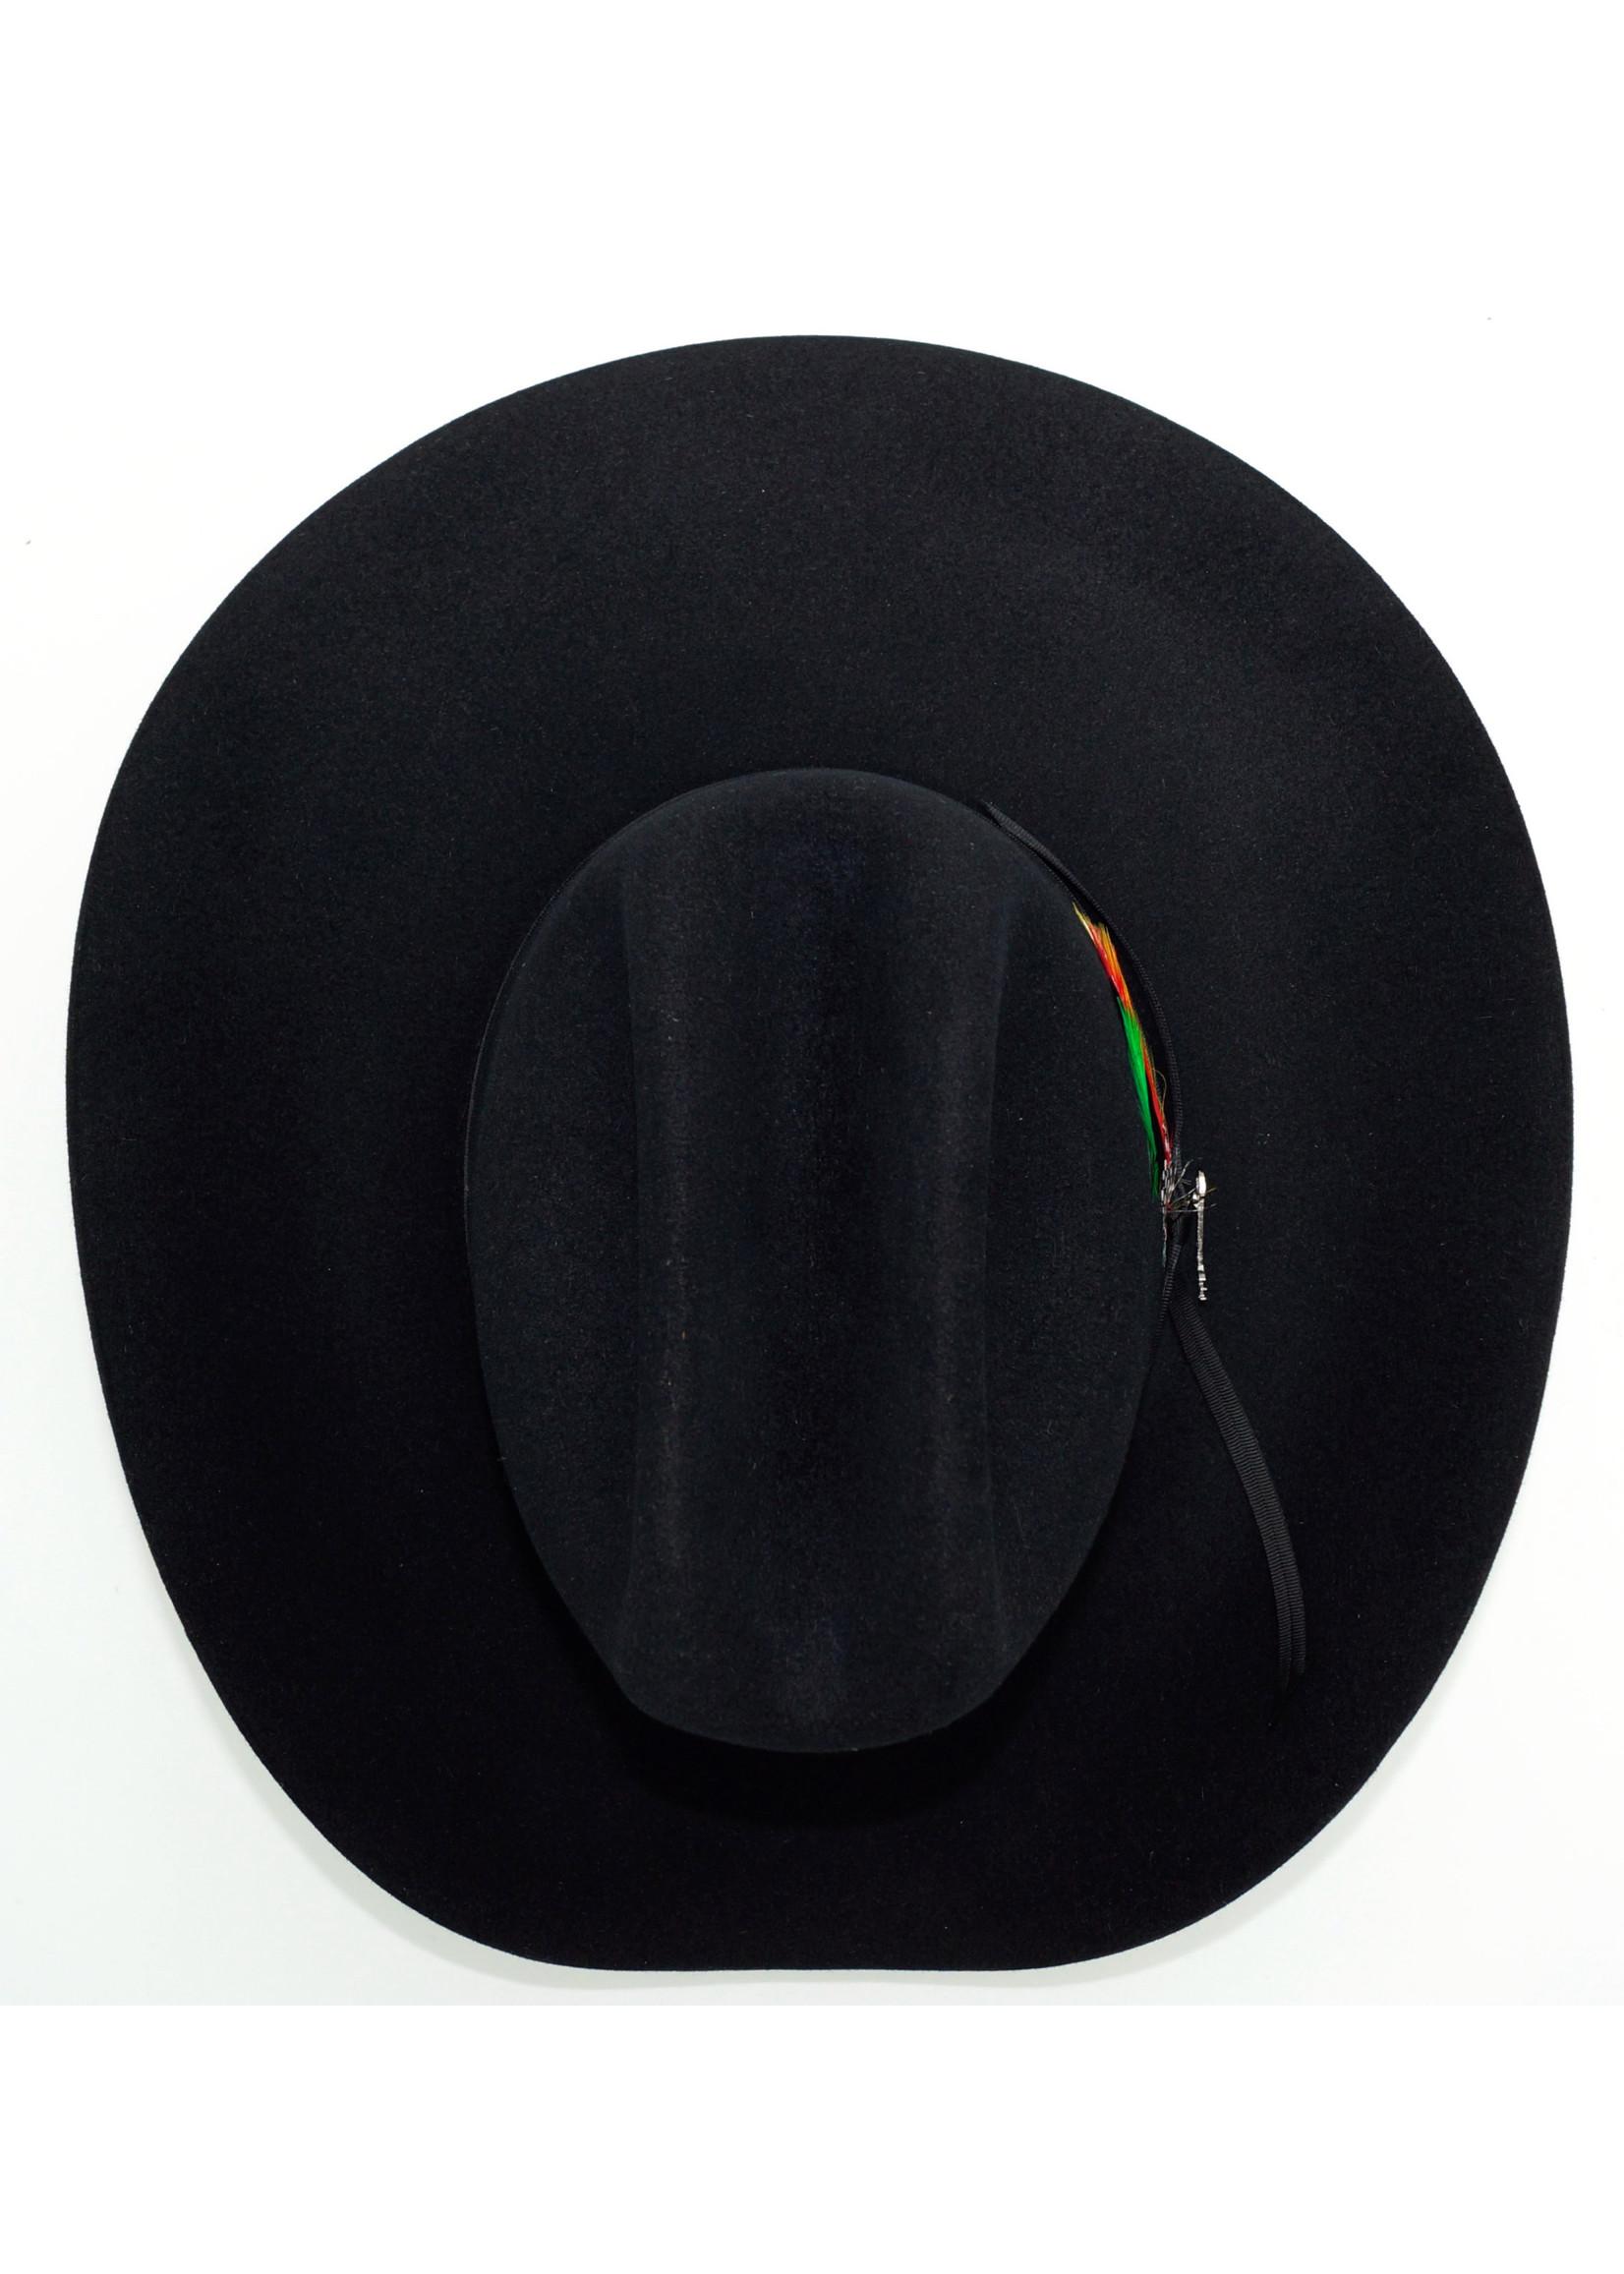 Stetson Rancher Black - 4 inch Brim